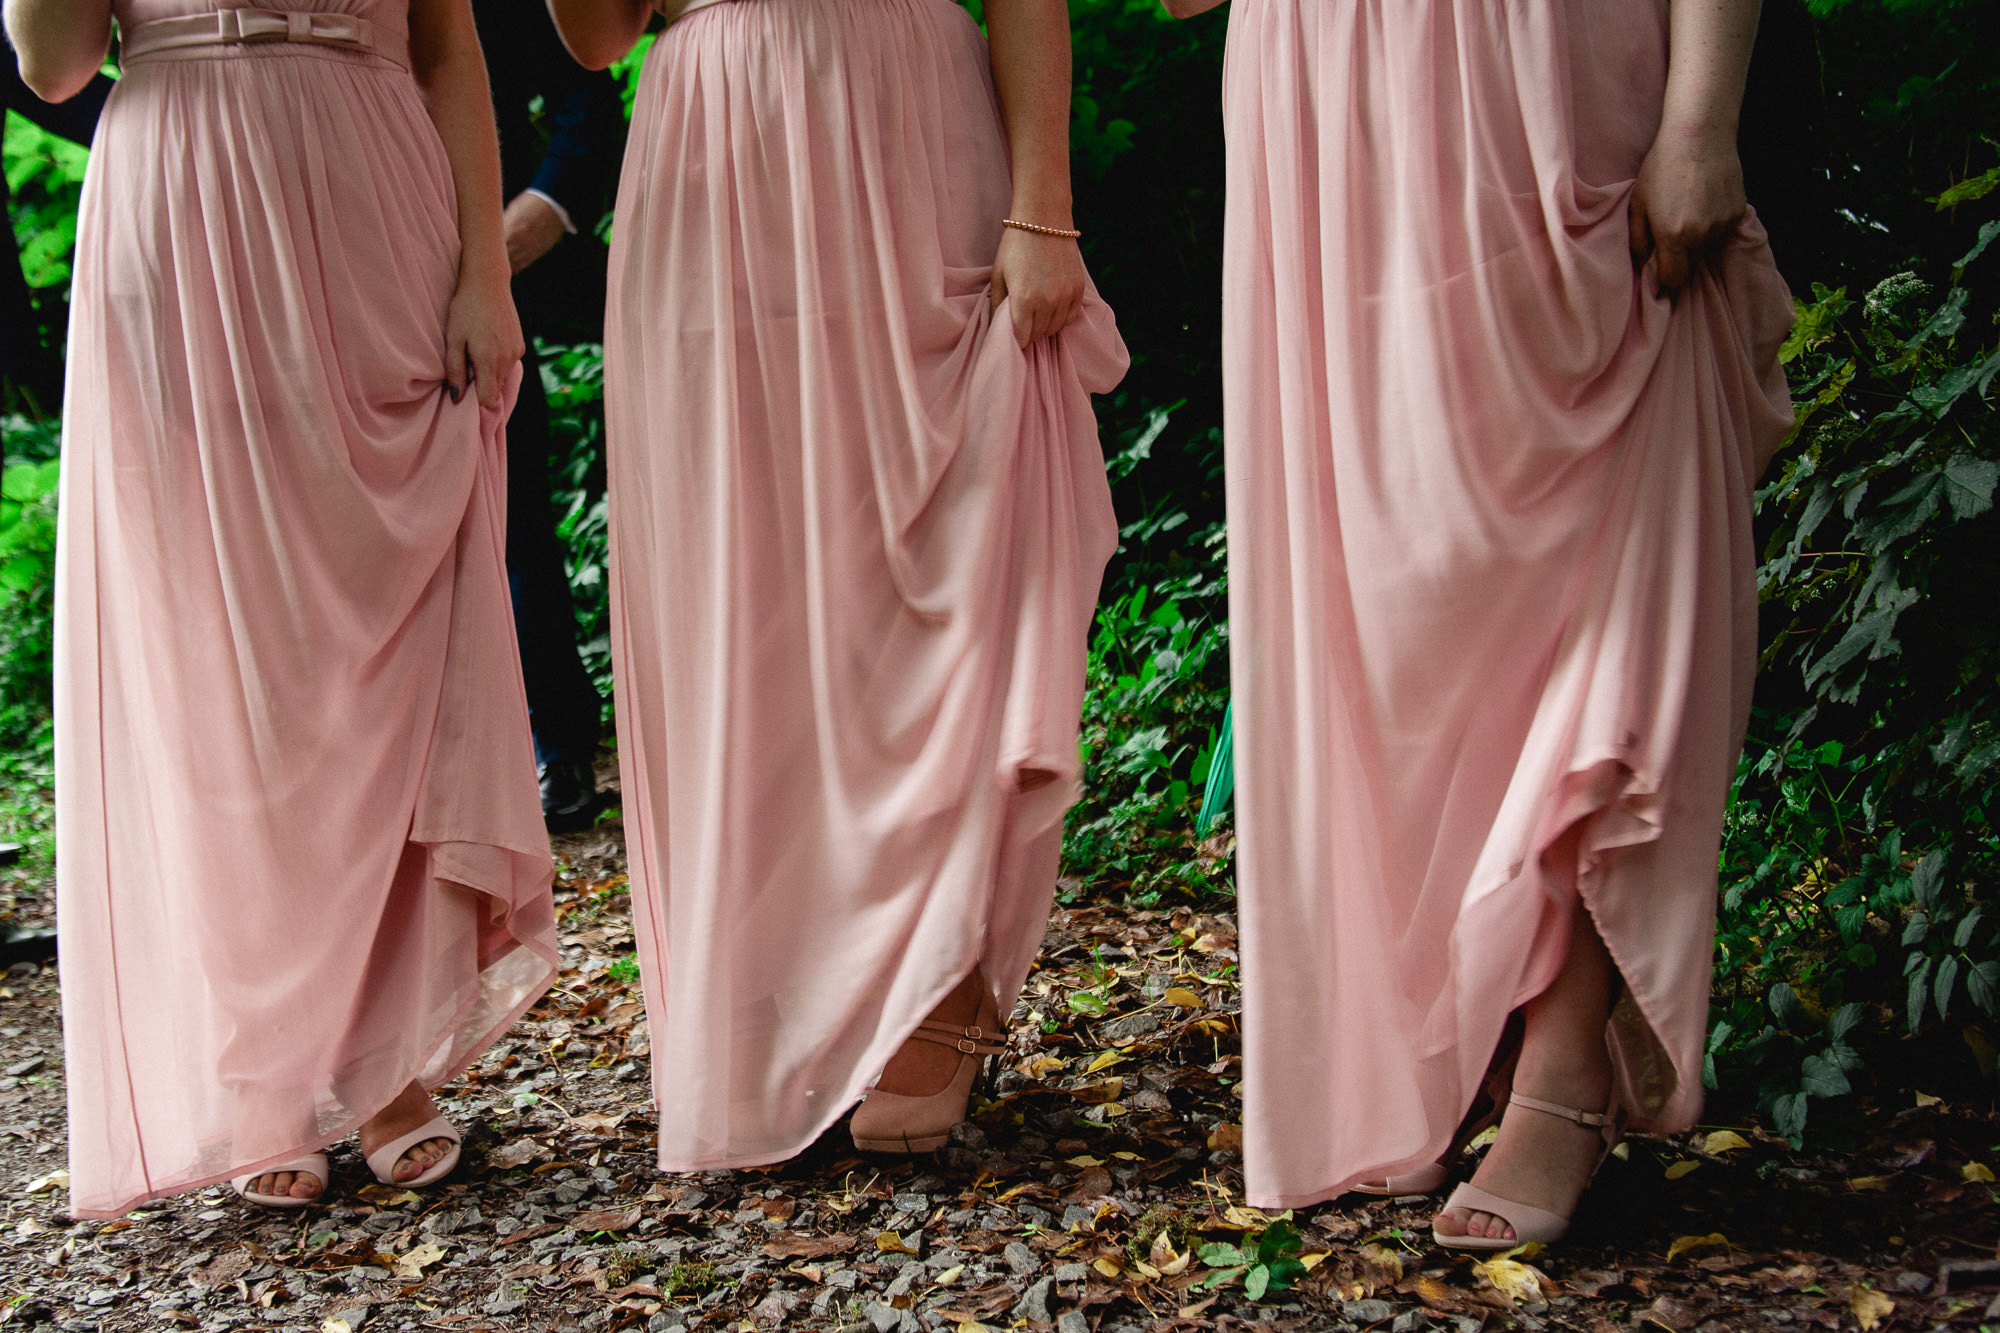 CLAIREBYRNEPHOTOGRAPHY-WEDDING-Ireland-tulffaris-alternative-fun-Lisa-terry-5.jpg